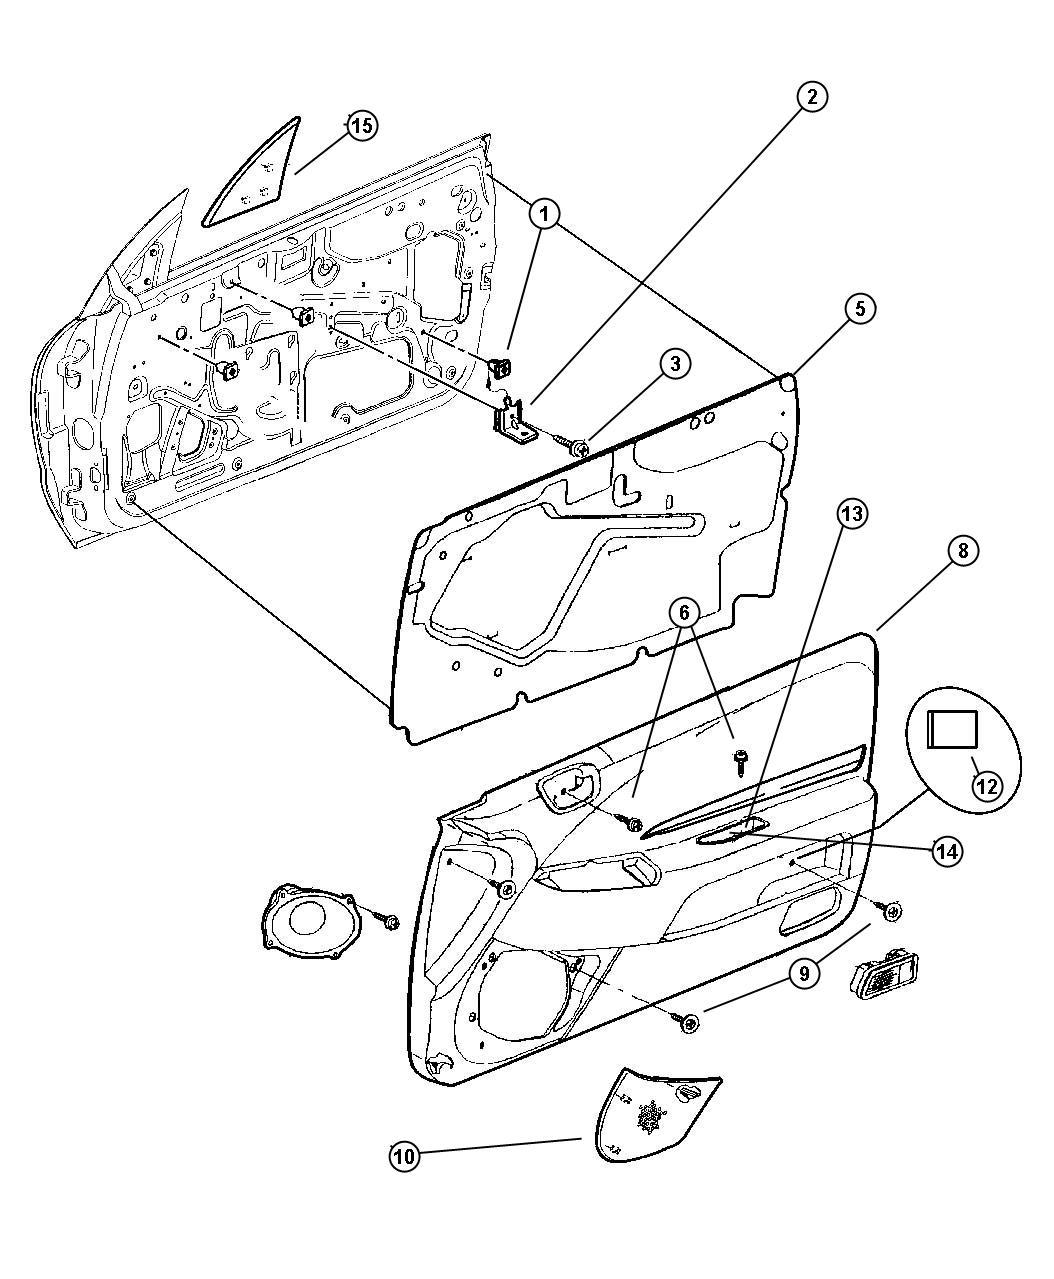 Chrysler Grille Right Speaker Trim O0 Color